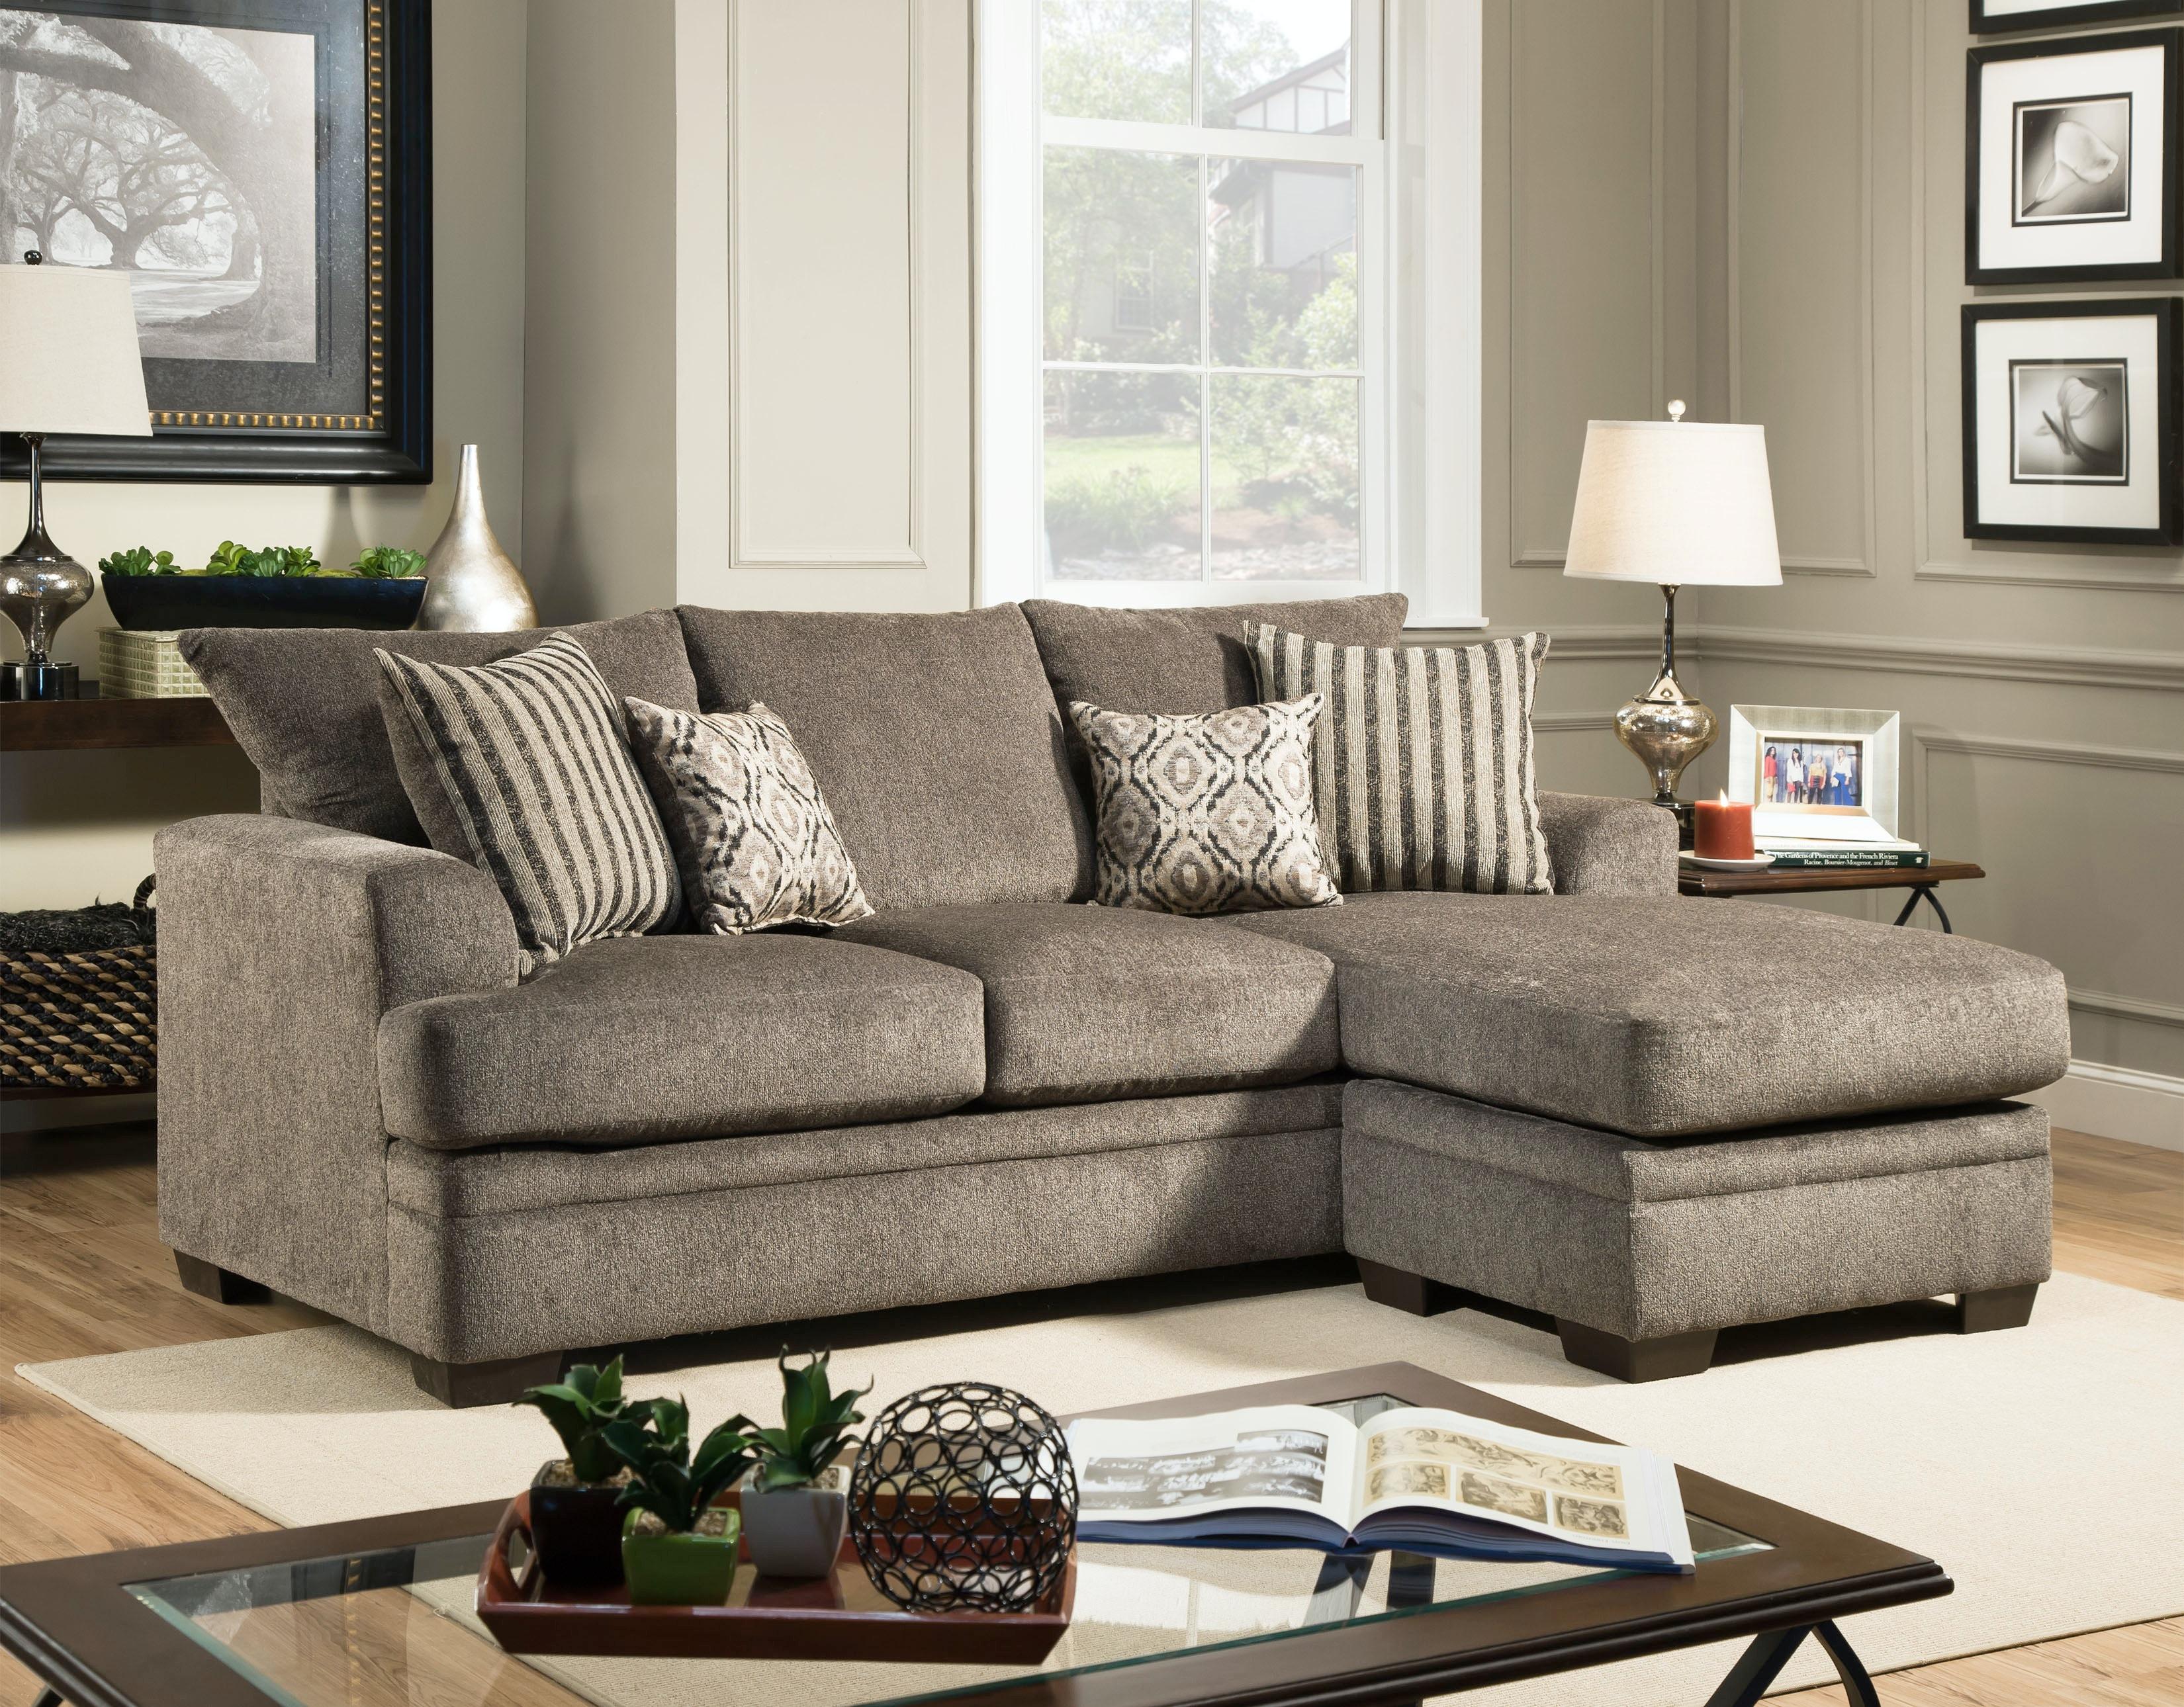 Etonnant American Furniture Chaise Sofa 817266 At Talsma Furniture